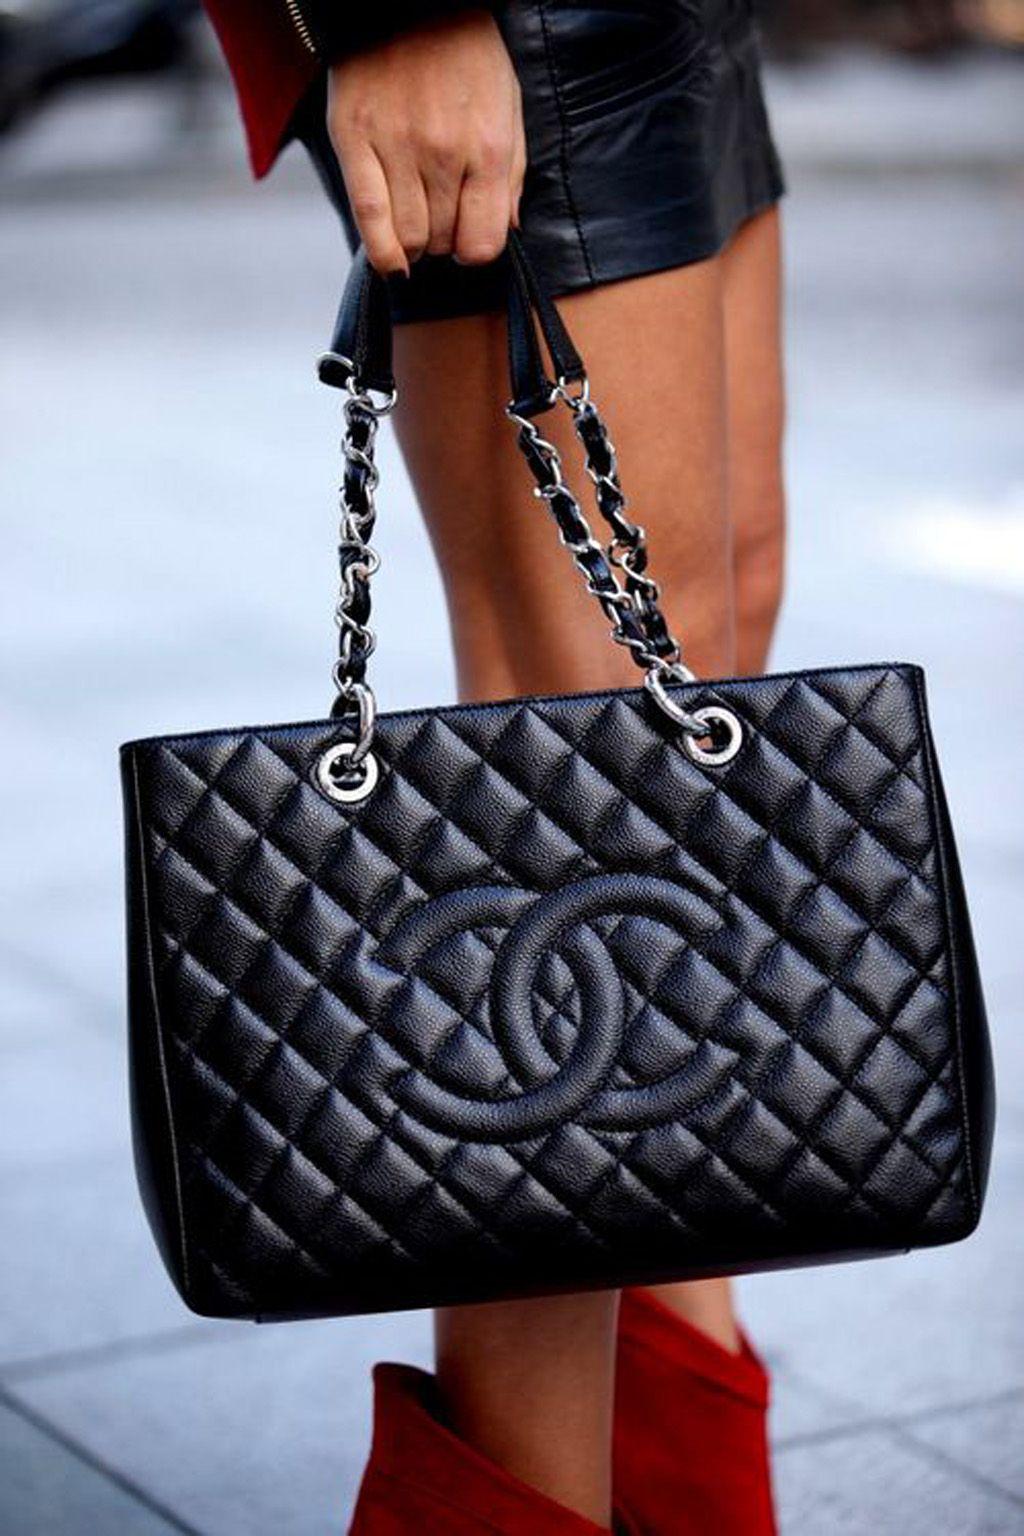 2 55 De Chanel Un Bolso Con Historia